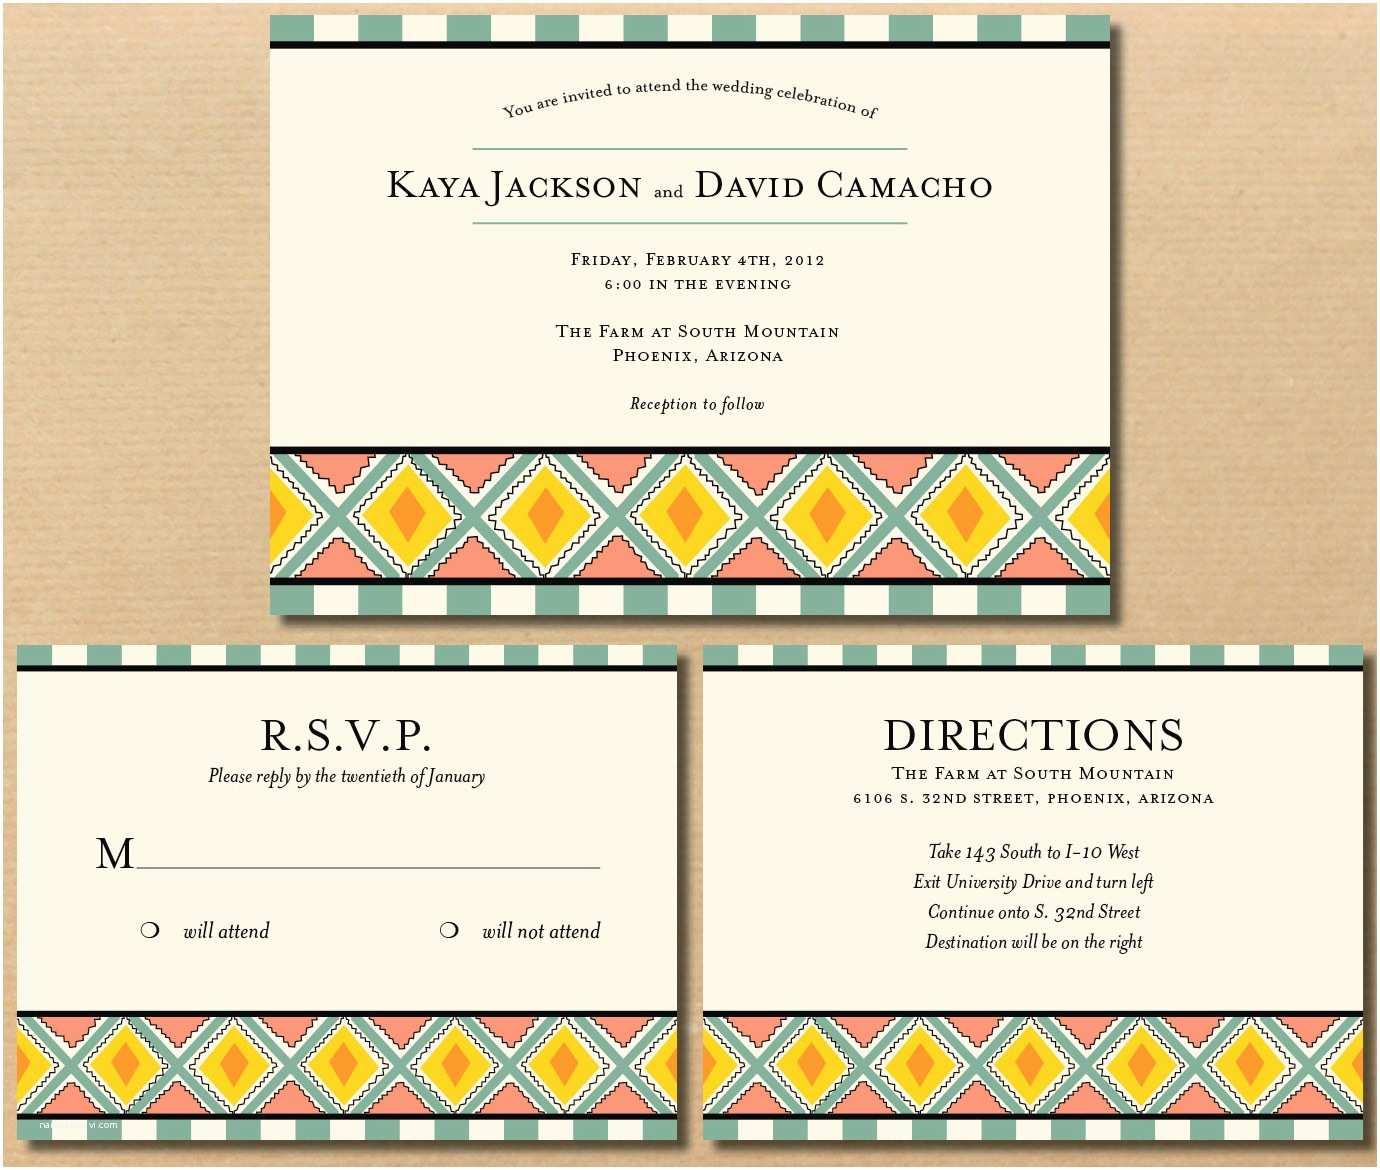 Native American Wedding Invitations River & Bridge Native American Influenced Wedding Invitations